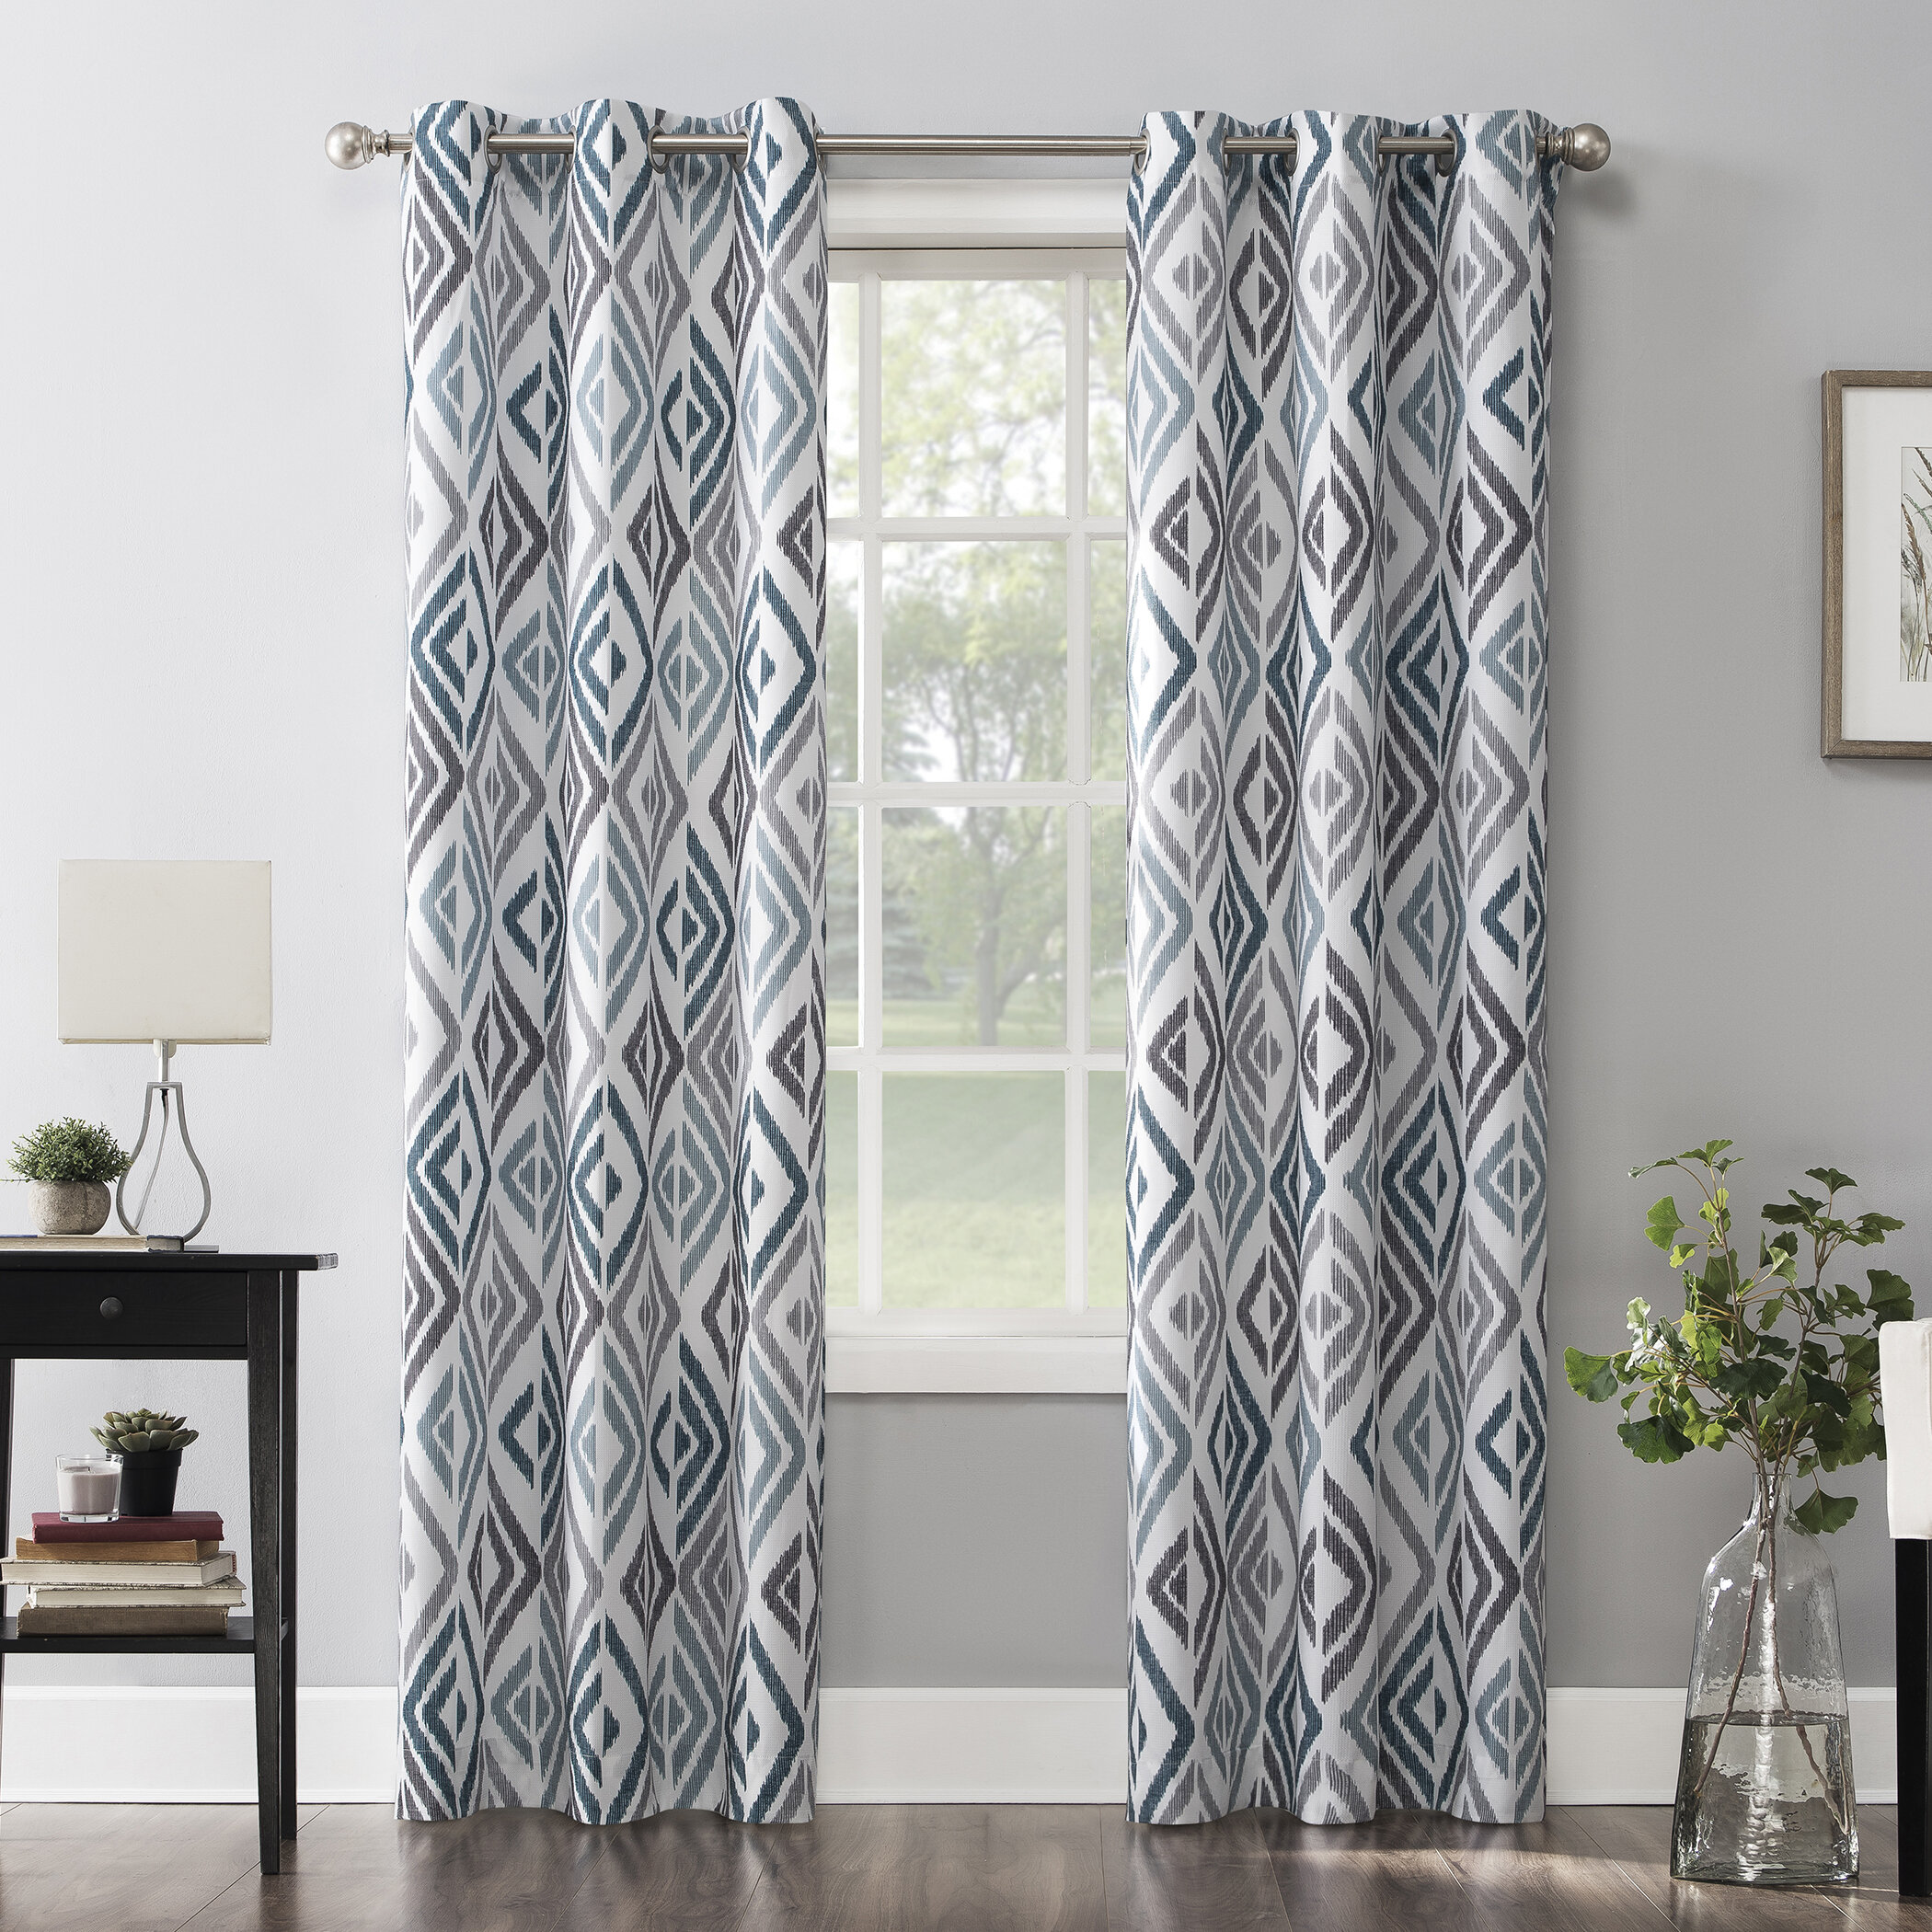 Ivy Bronx Chaunte Ikat Semi Sheer Grommet Single Curtain Panel Reviews Wayfair